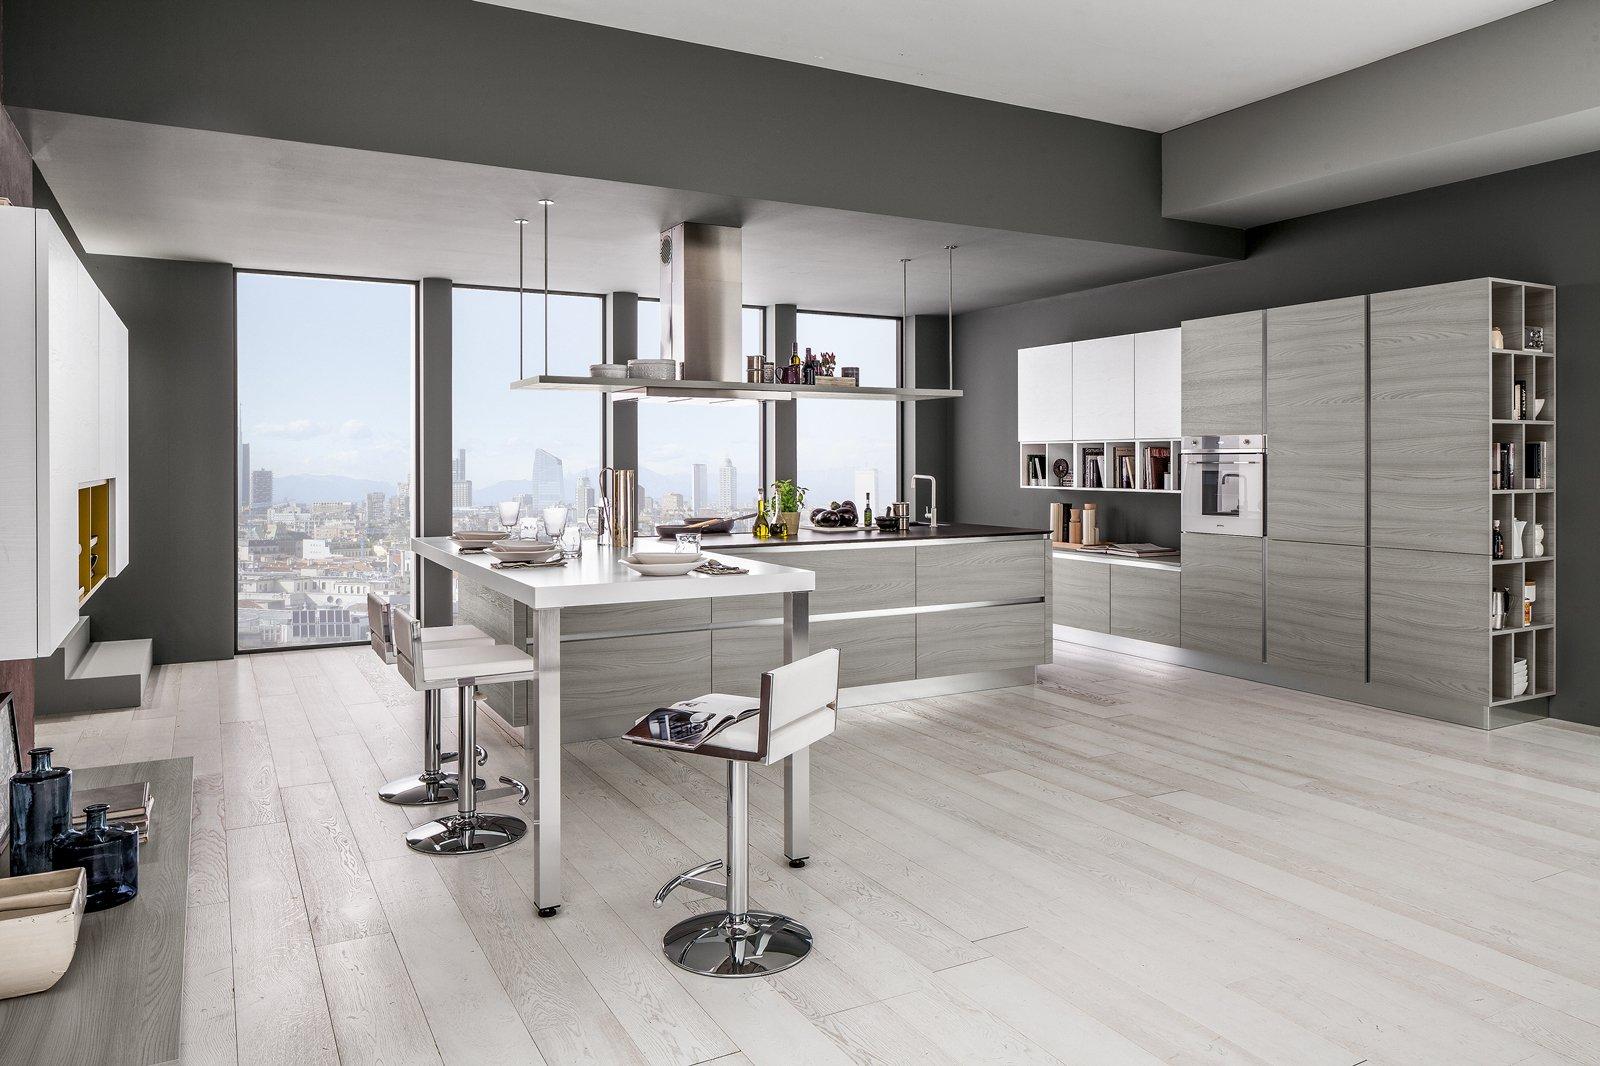 Cucine moderne con isola centrale cucina moderna orange - Cucine con isola centrale moderne ...